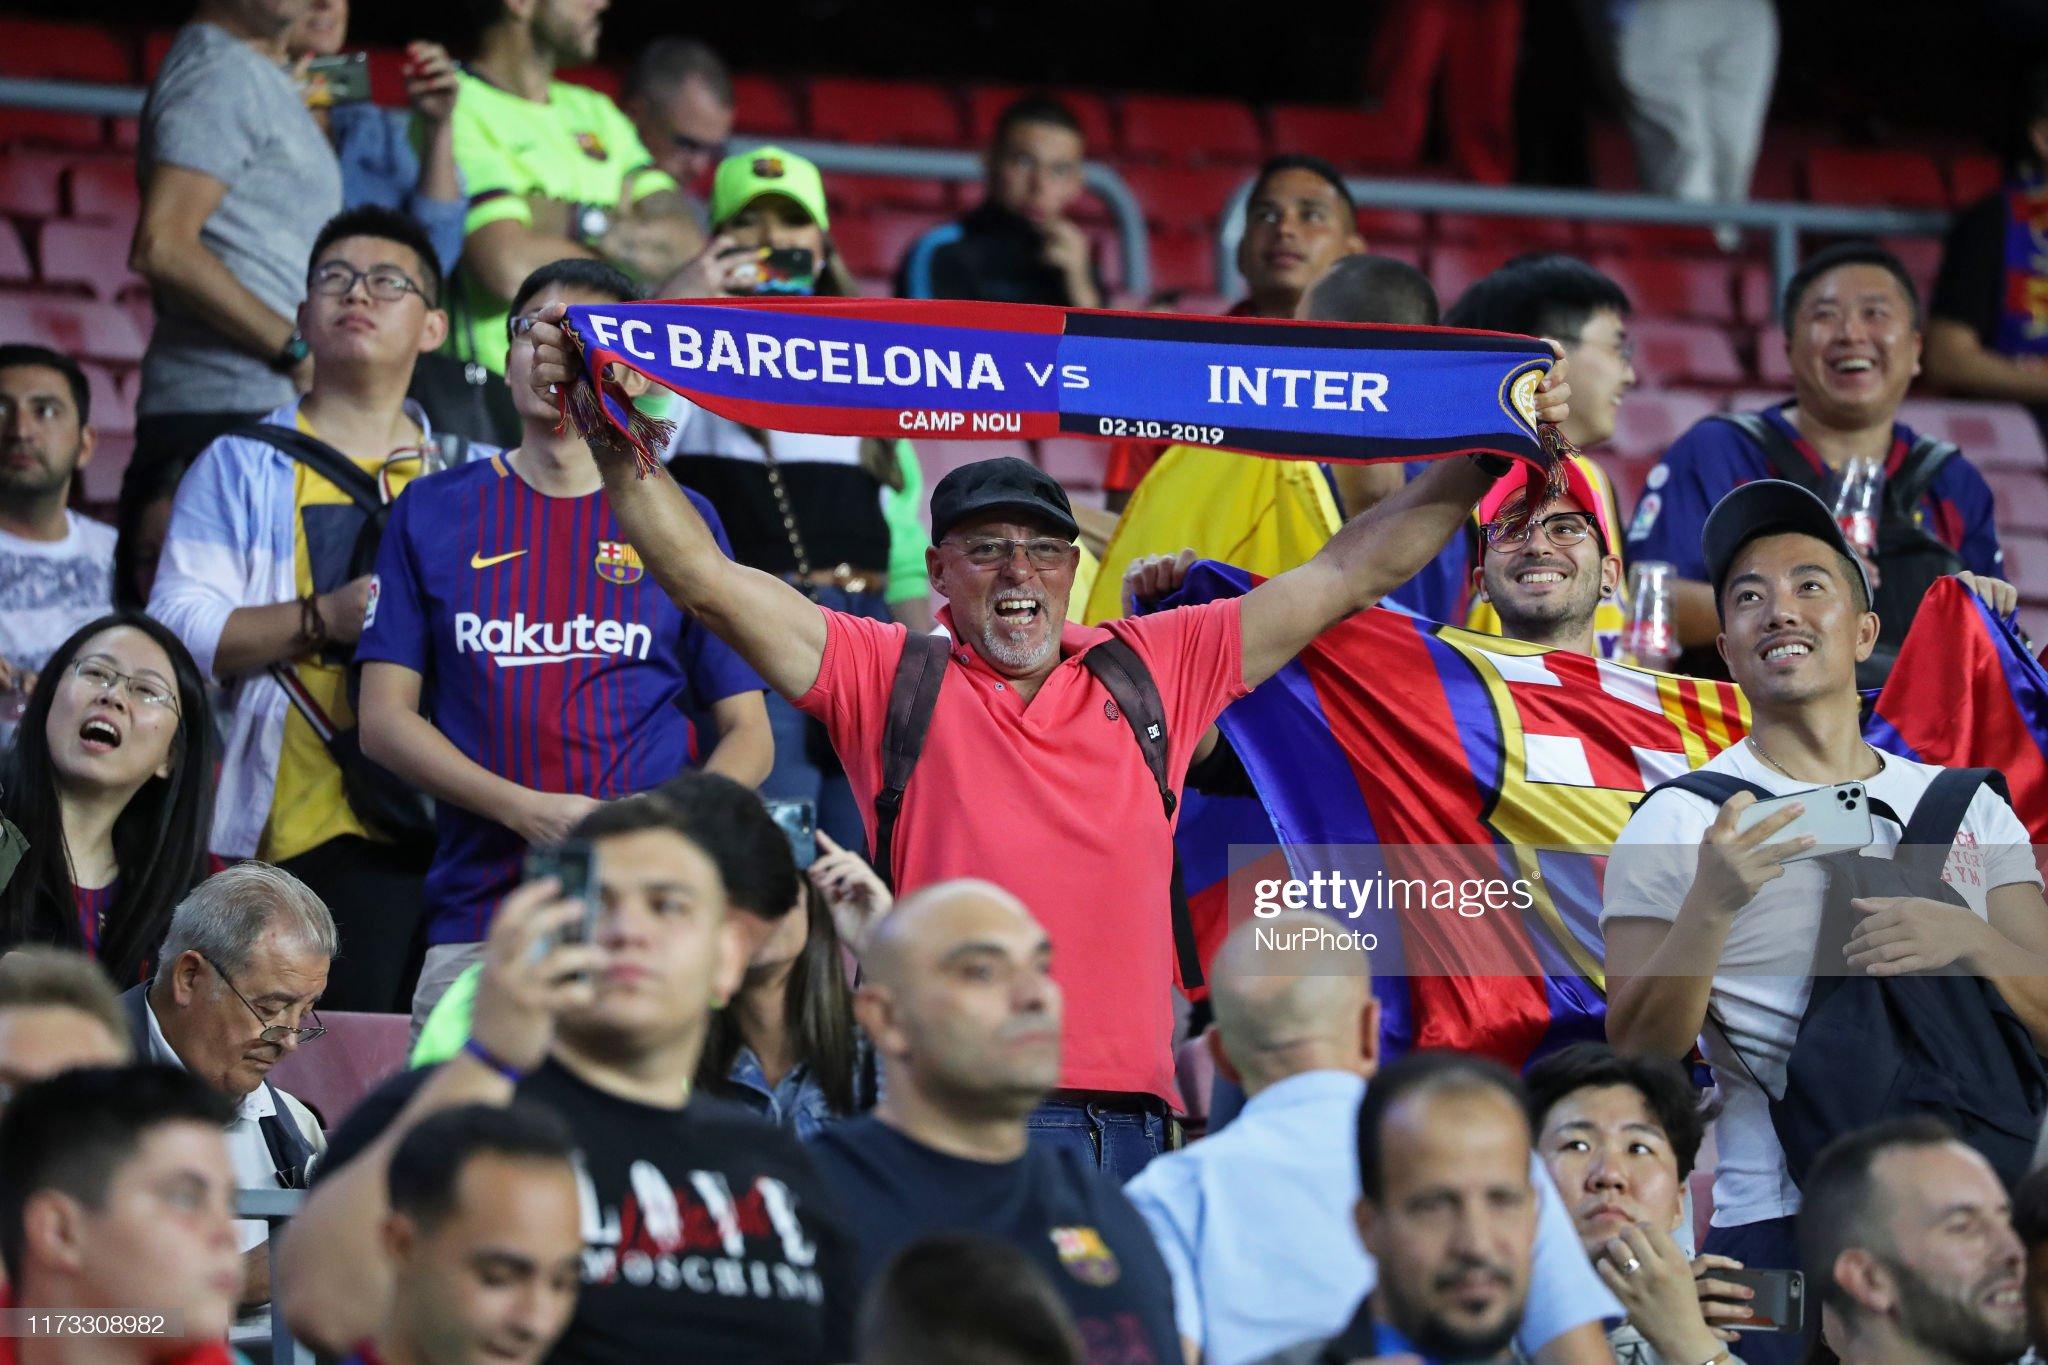 صور مباراة : برشلونة - إنتر 2-1 ( 02-10-2019 )  Supporter-during-the-match-between-fc-barcelona-between-inter-to-the-picture-id1173308982?s=2048x2048